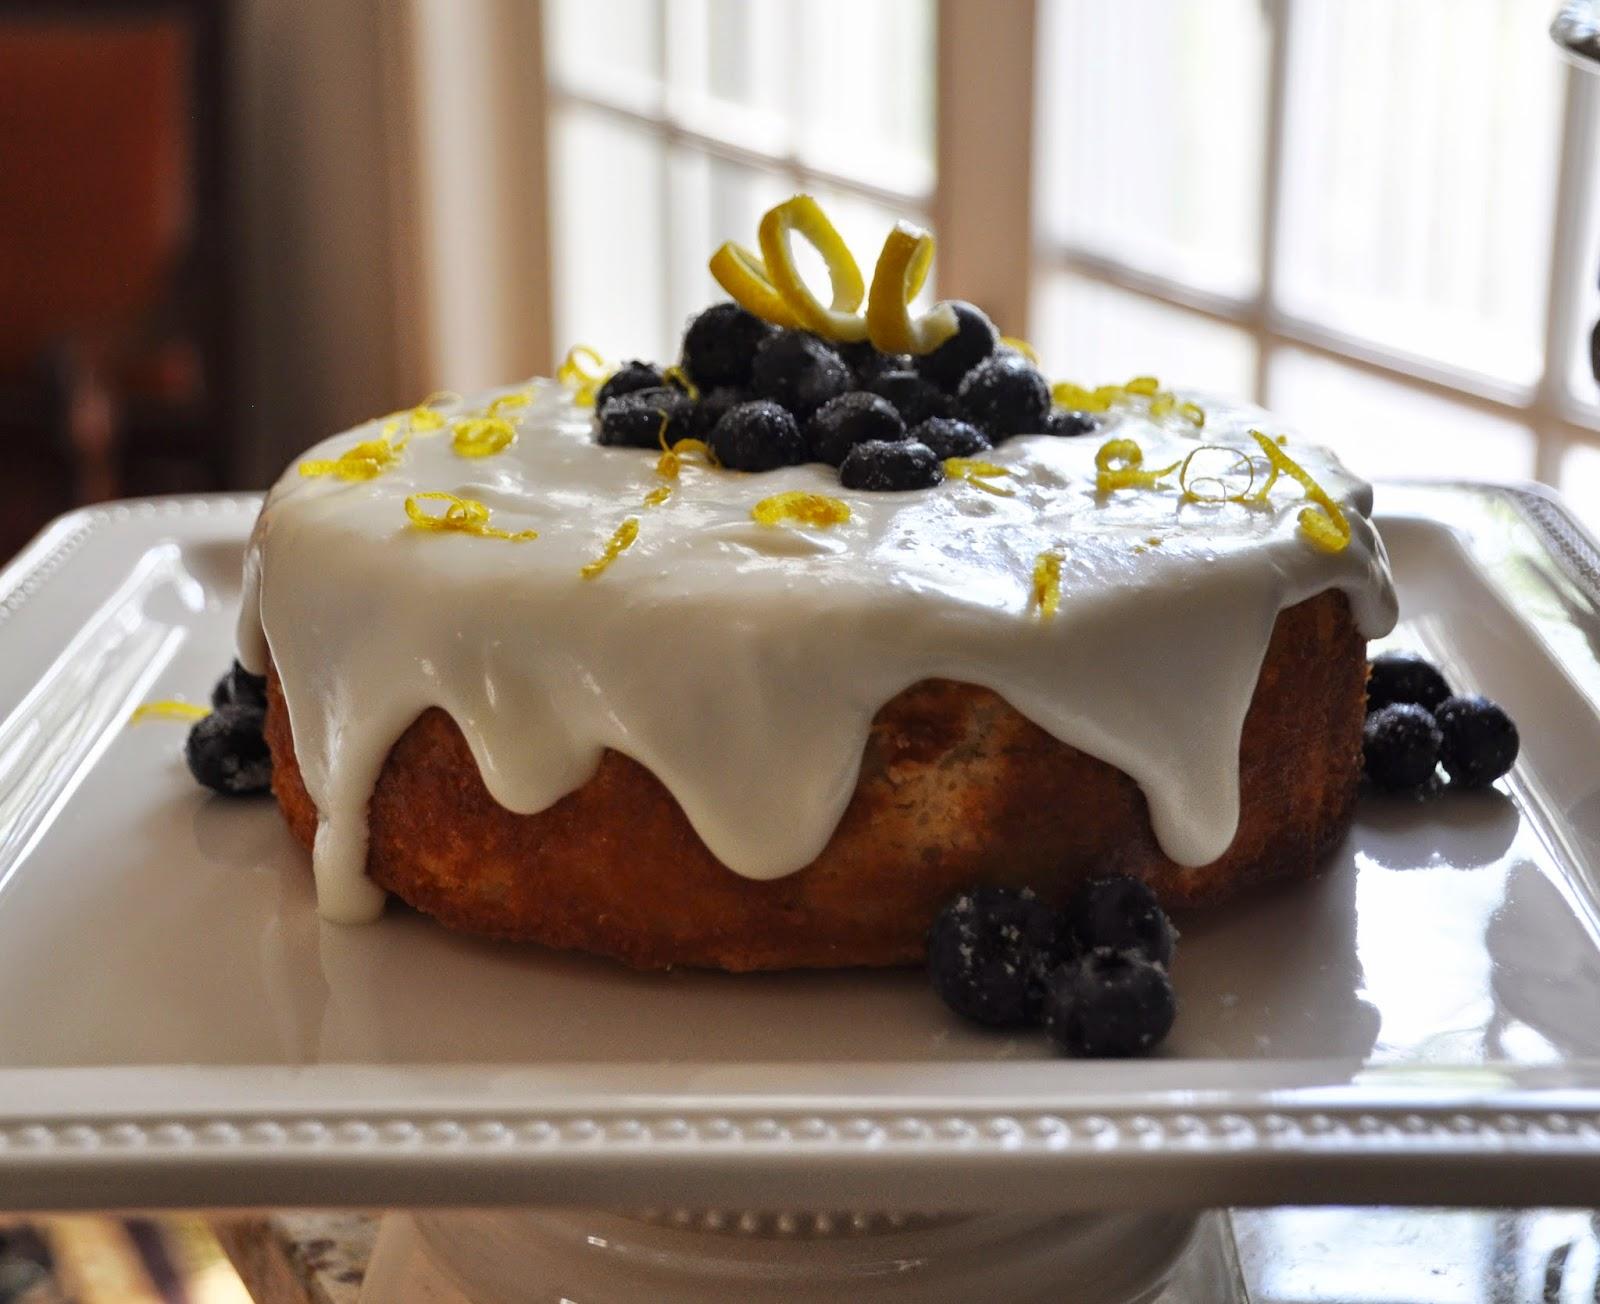 A LA GRAHAM: LEMON CAKE